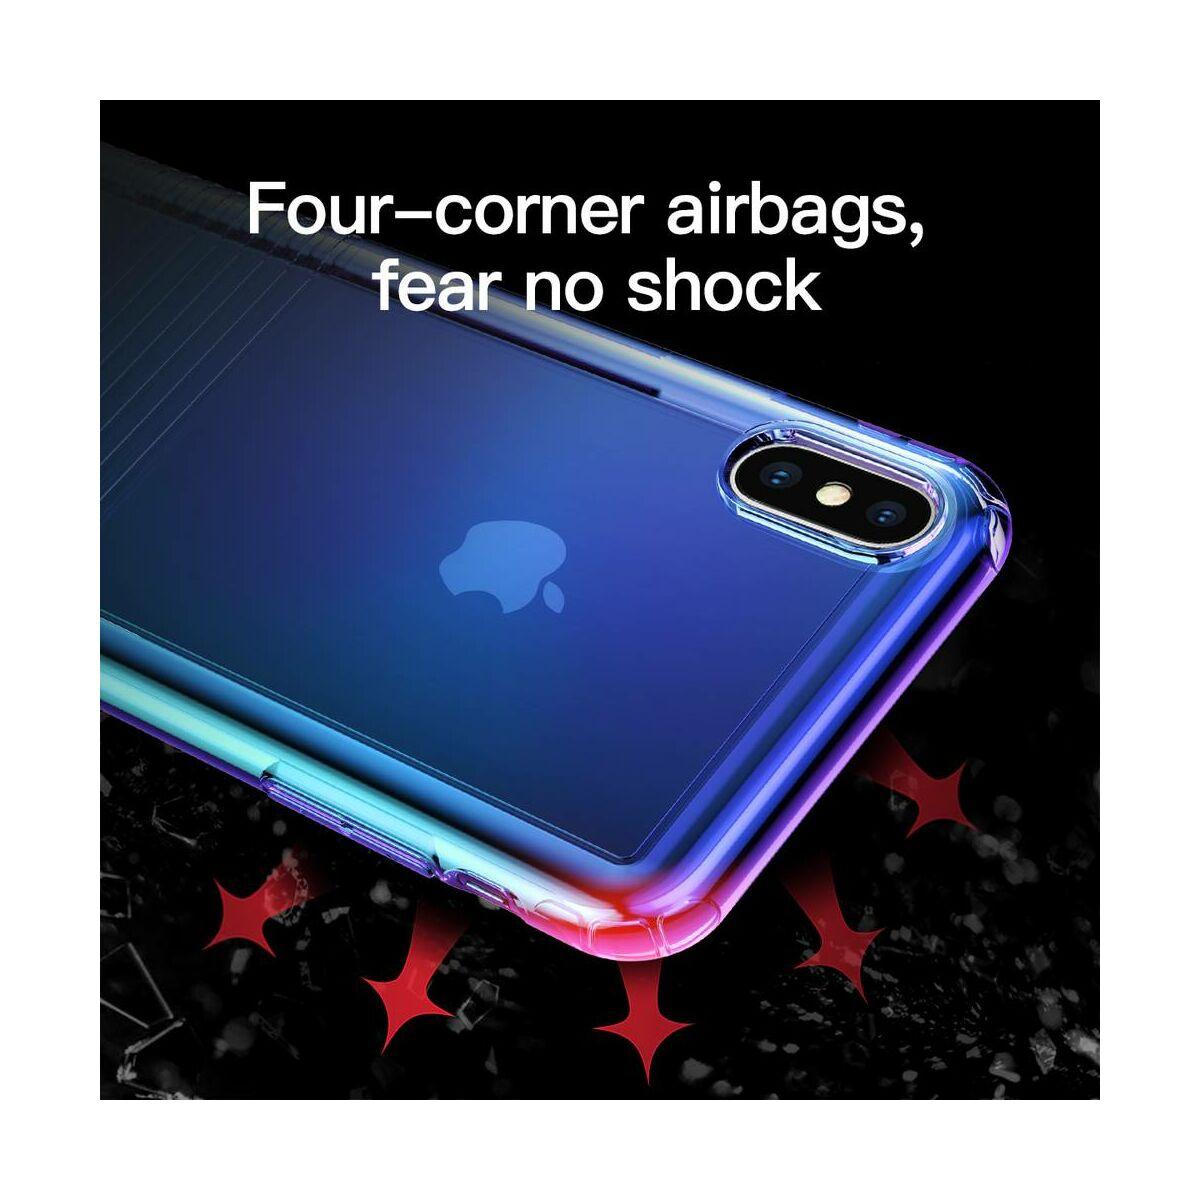 Baseus iPhone XS tok, Colorful Airbag, kék (WIAPIPH58-XC03)